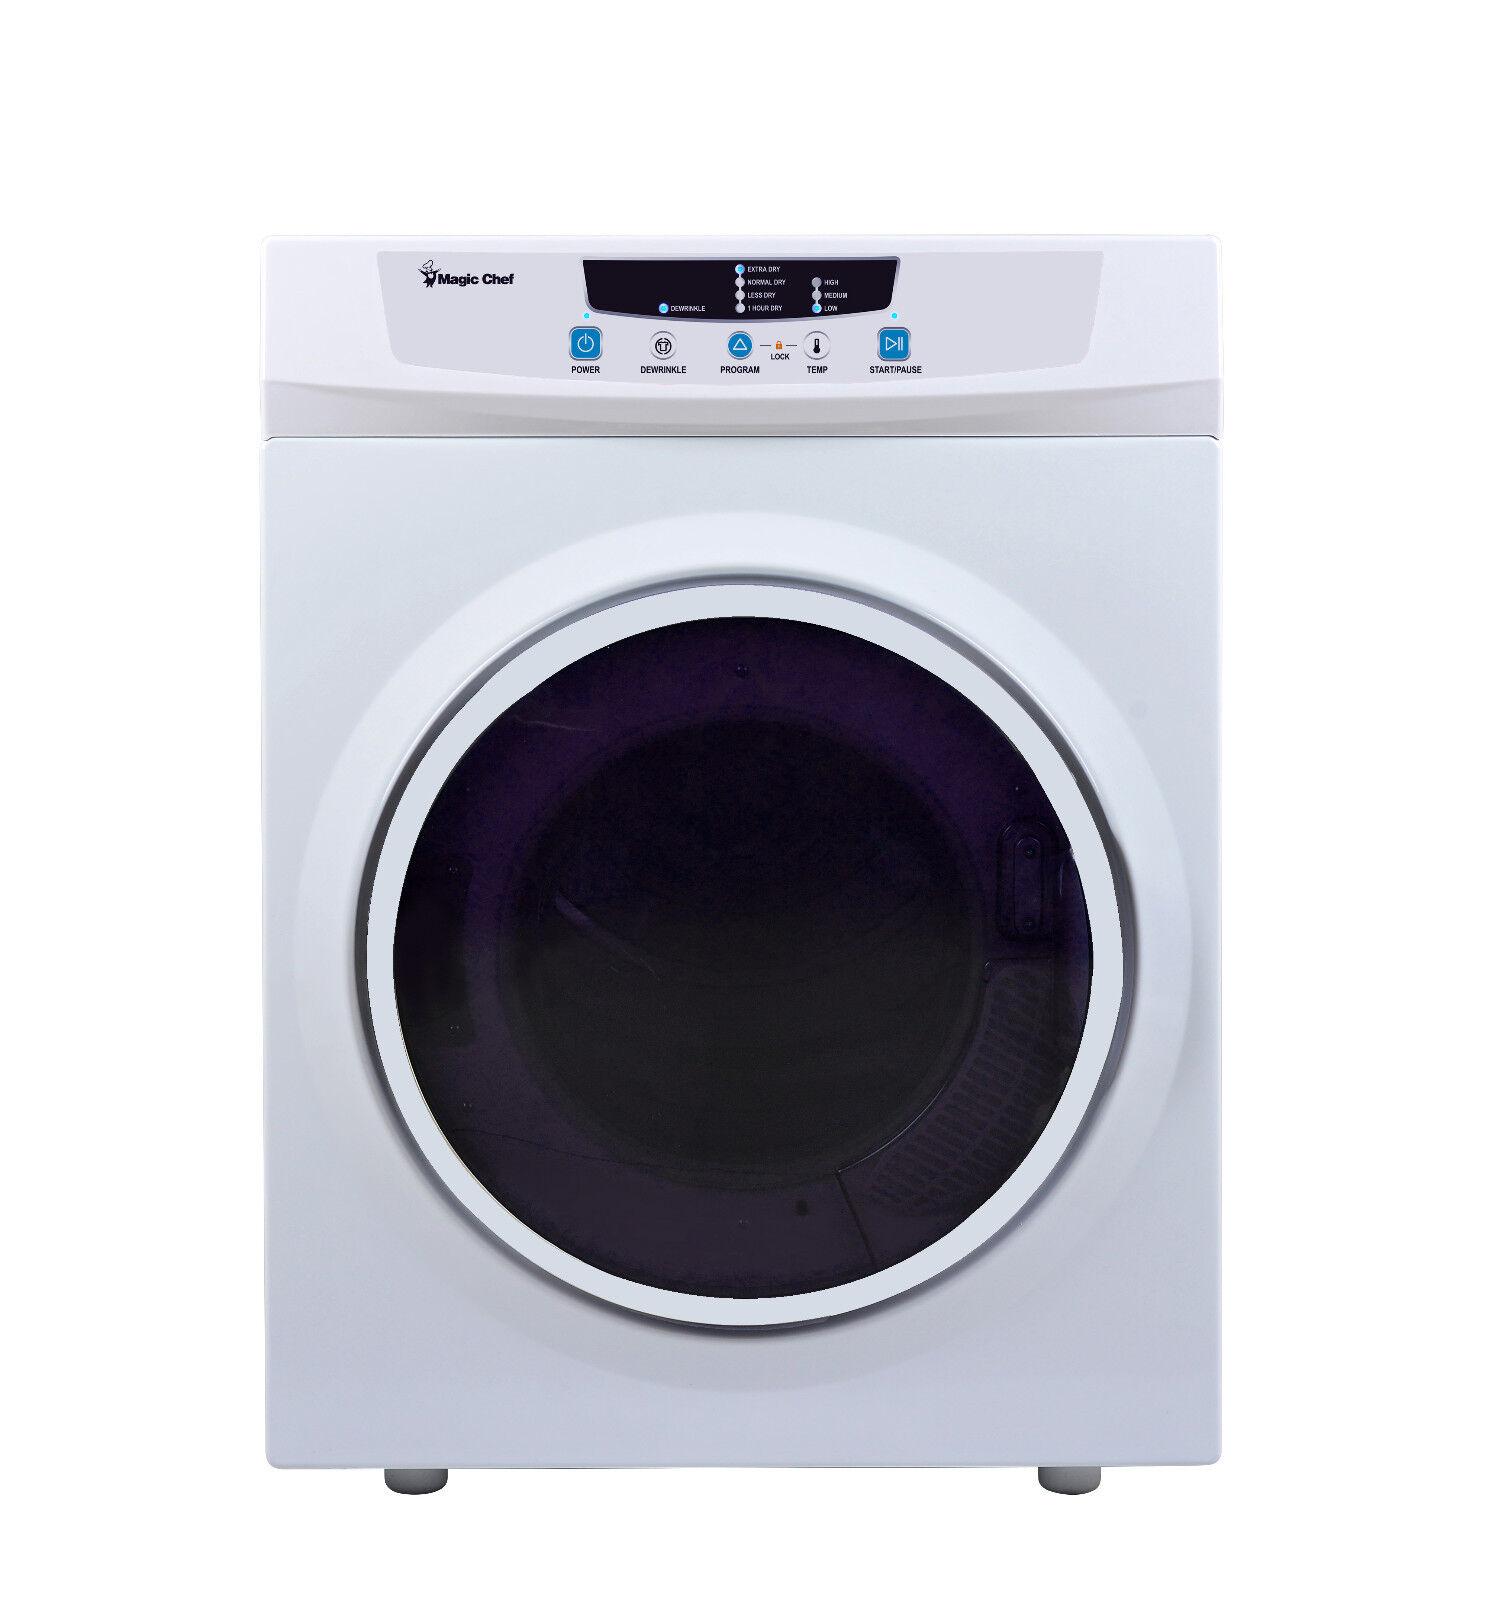 s l1600 dryers ebay  at webbmarketing.co